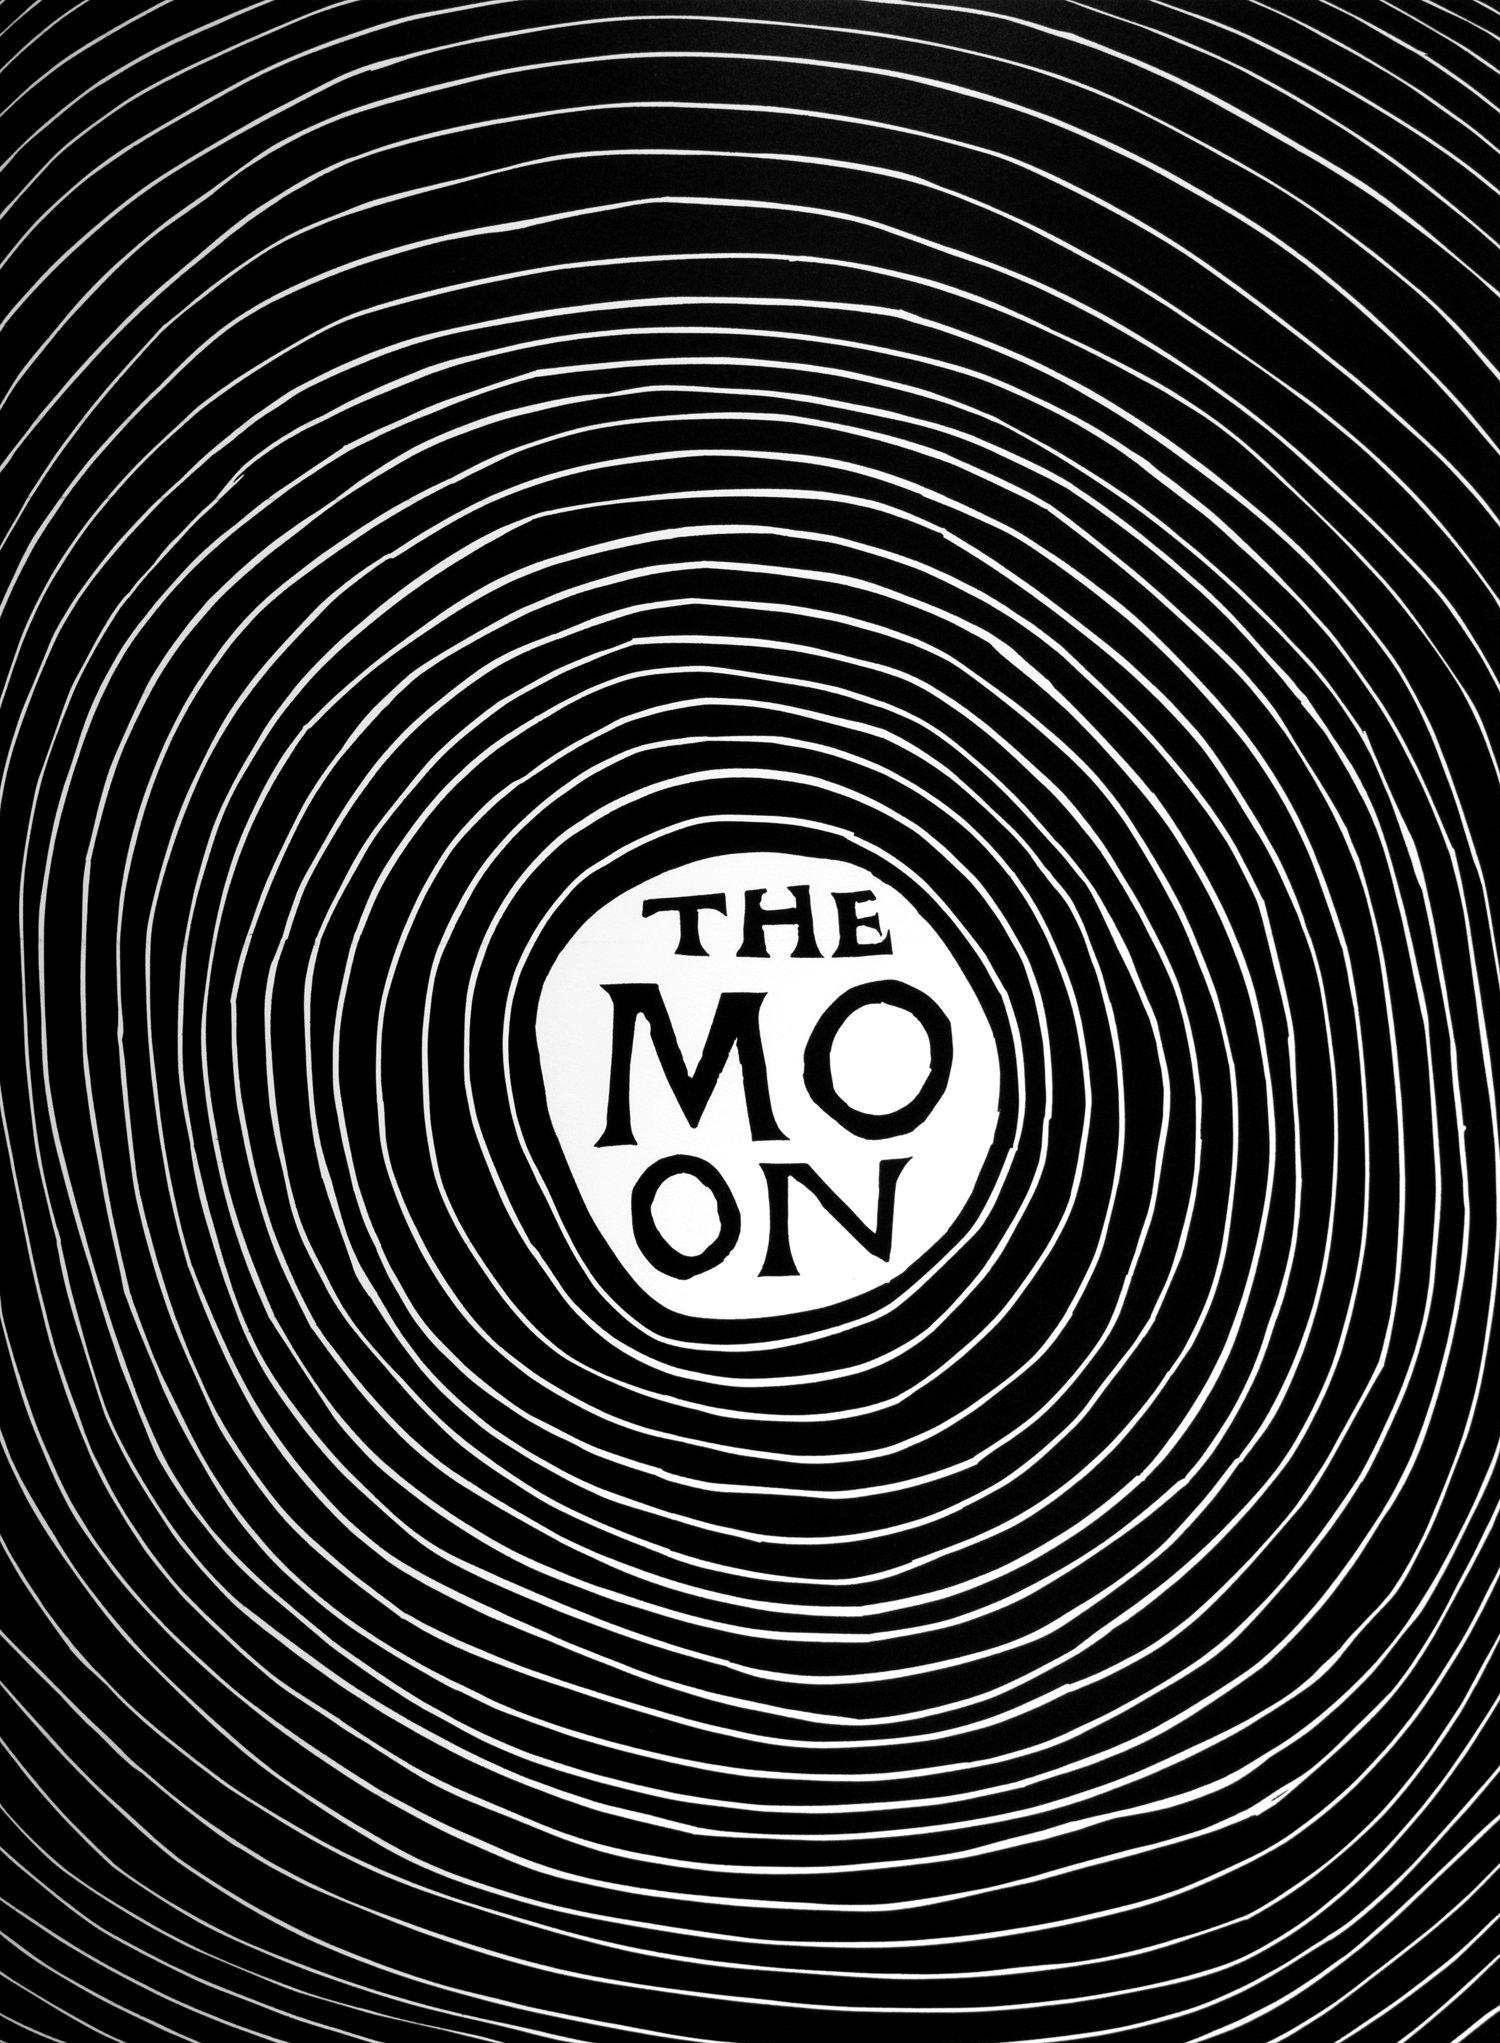 The Moon by David Shrigley